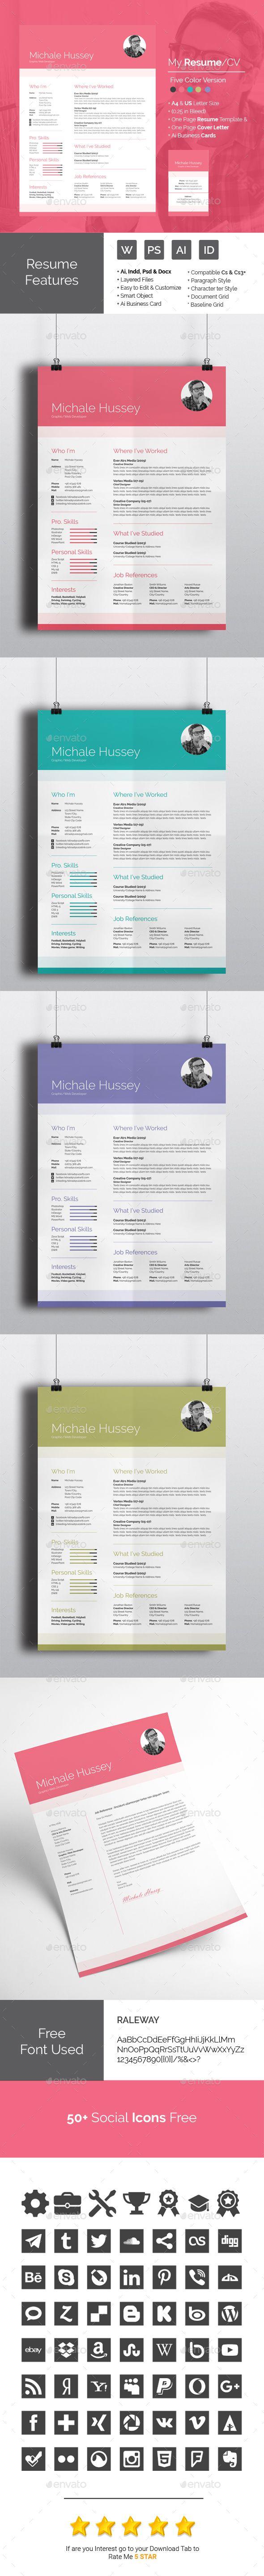 Best 25 My Cv Ideas On Pinterest Cv Infographic Cv Format For